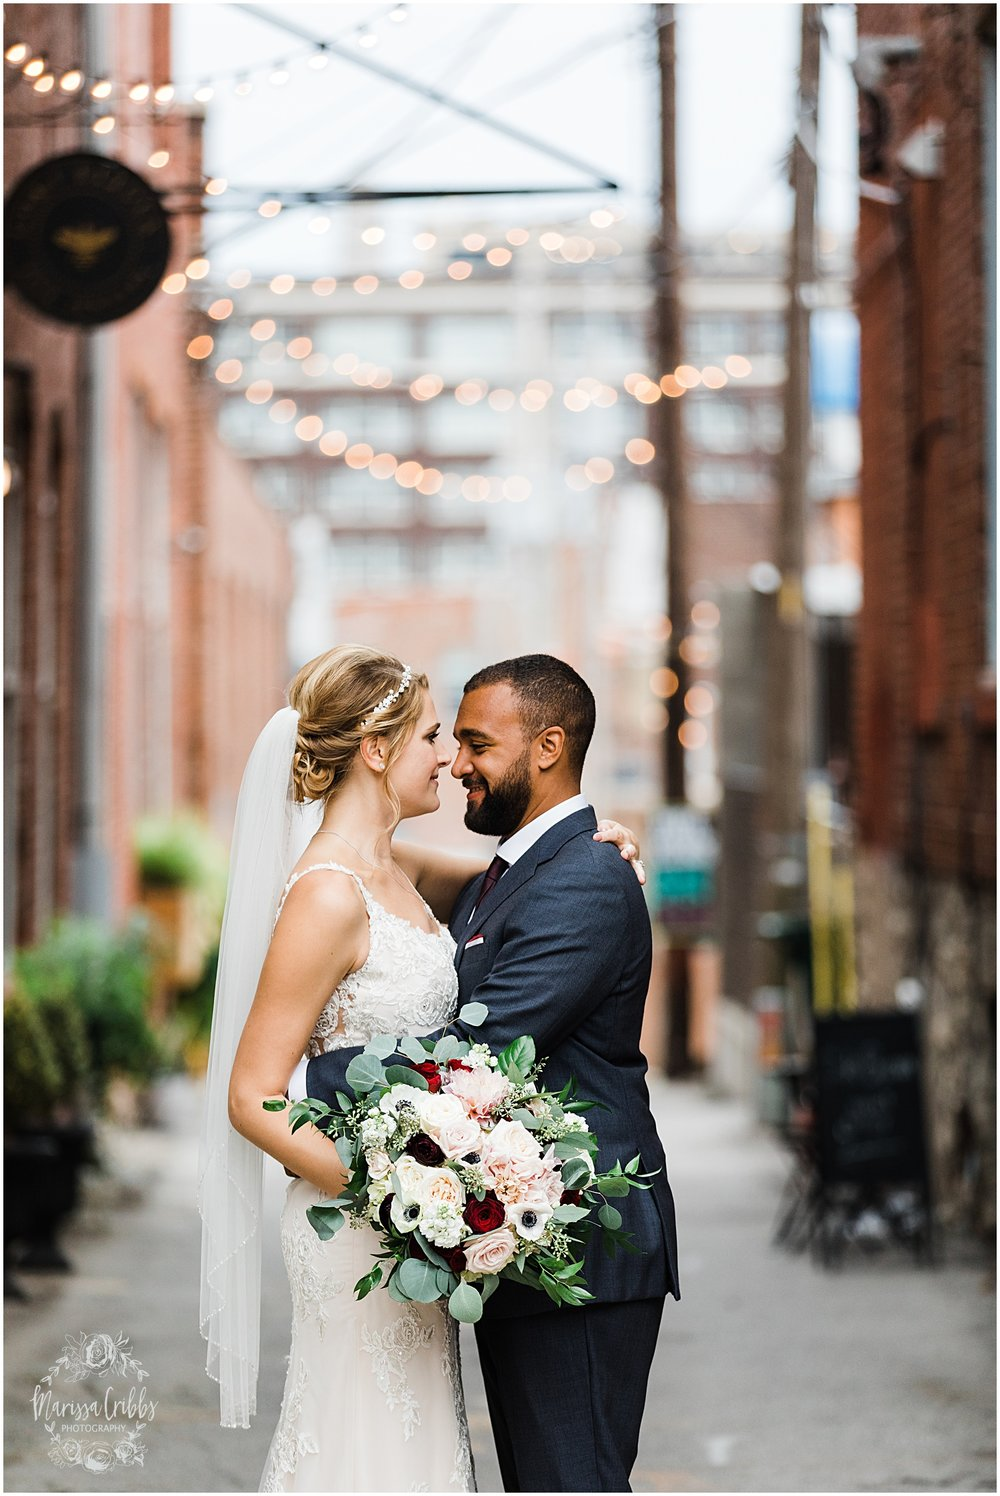 BAUER WEDDING | KELSEA & JUSTIN | MARISSA CRIBBS PHOTOGRAPHY_6563.jpg